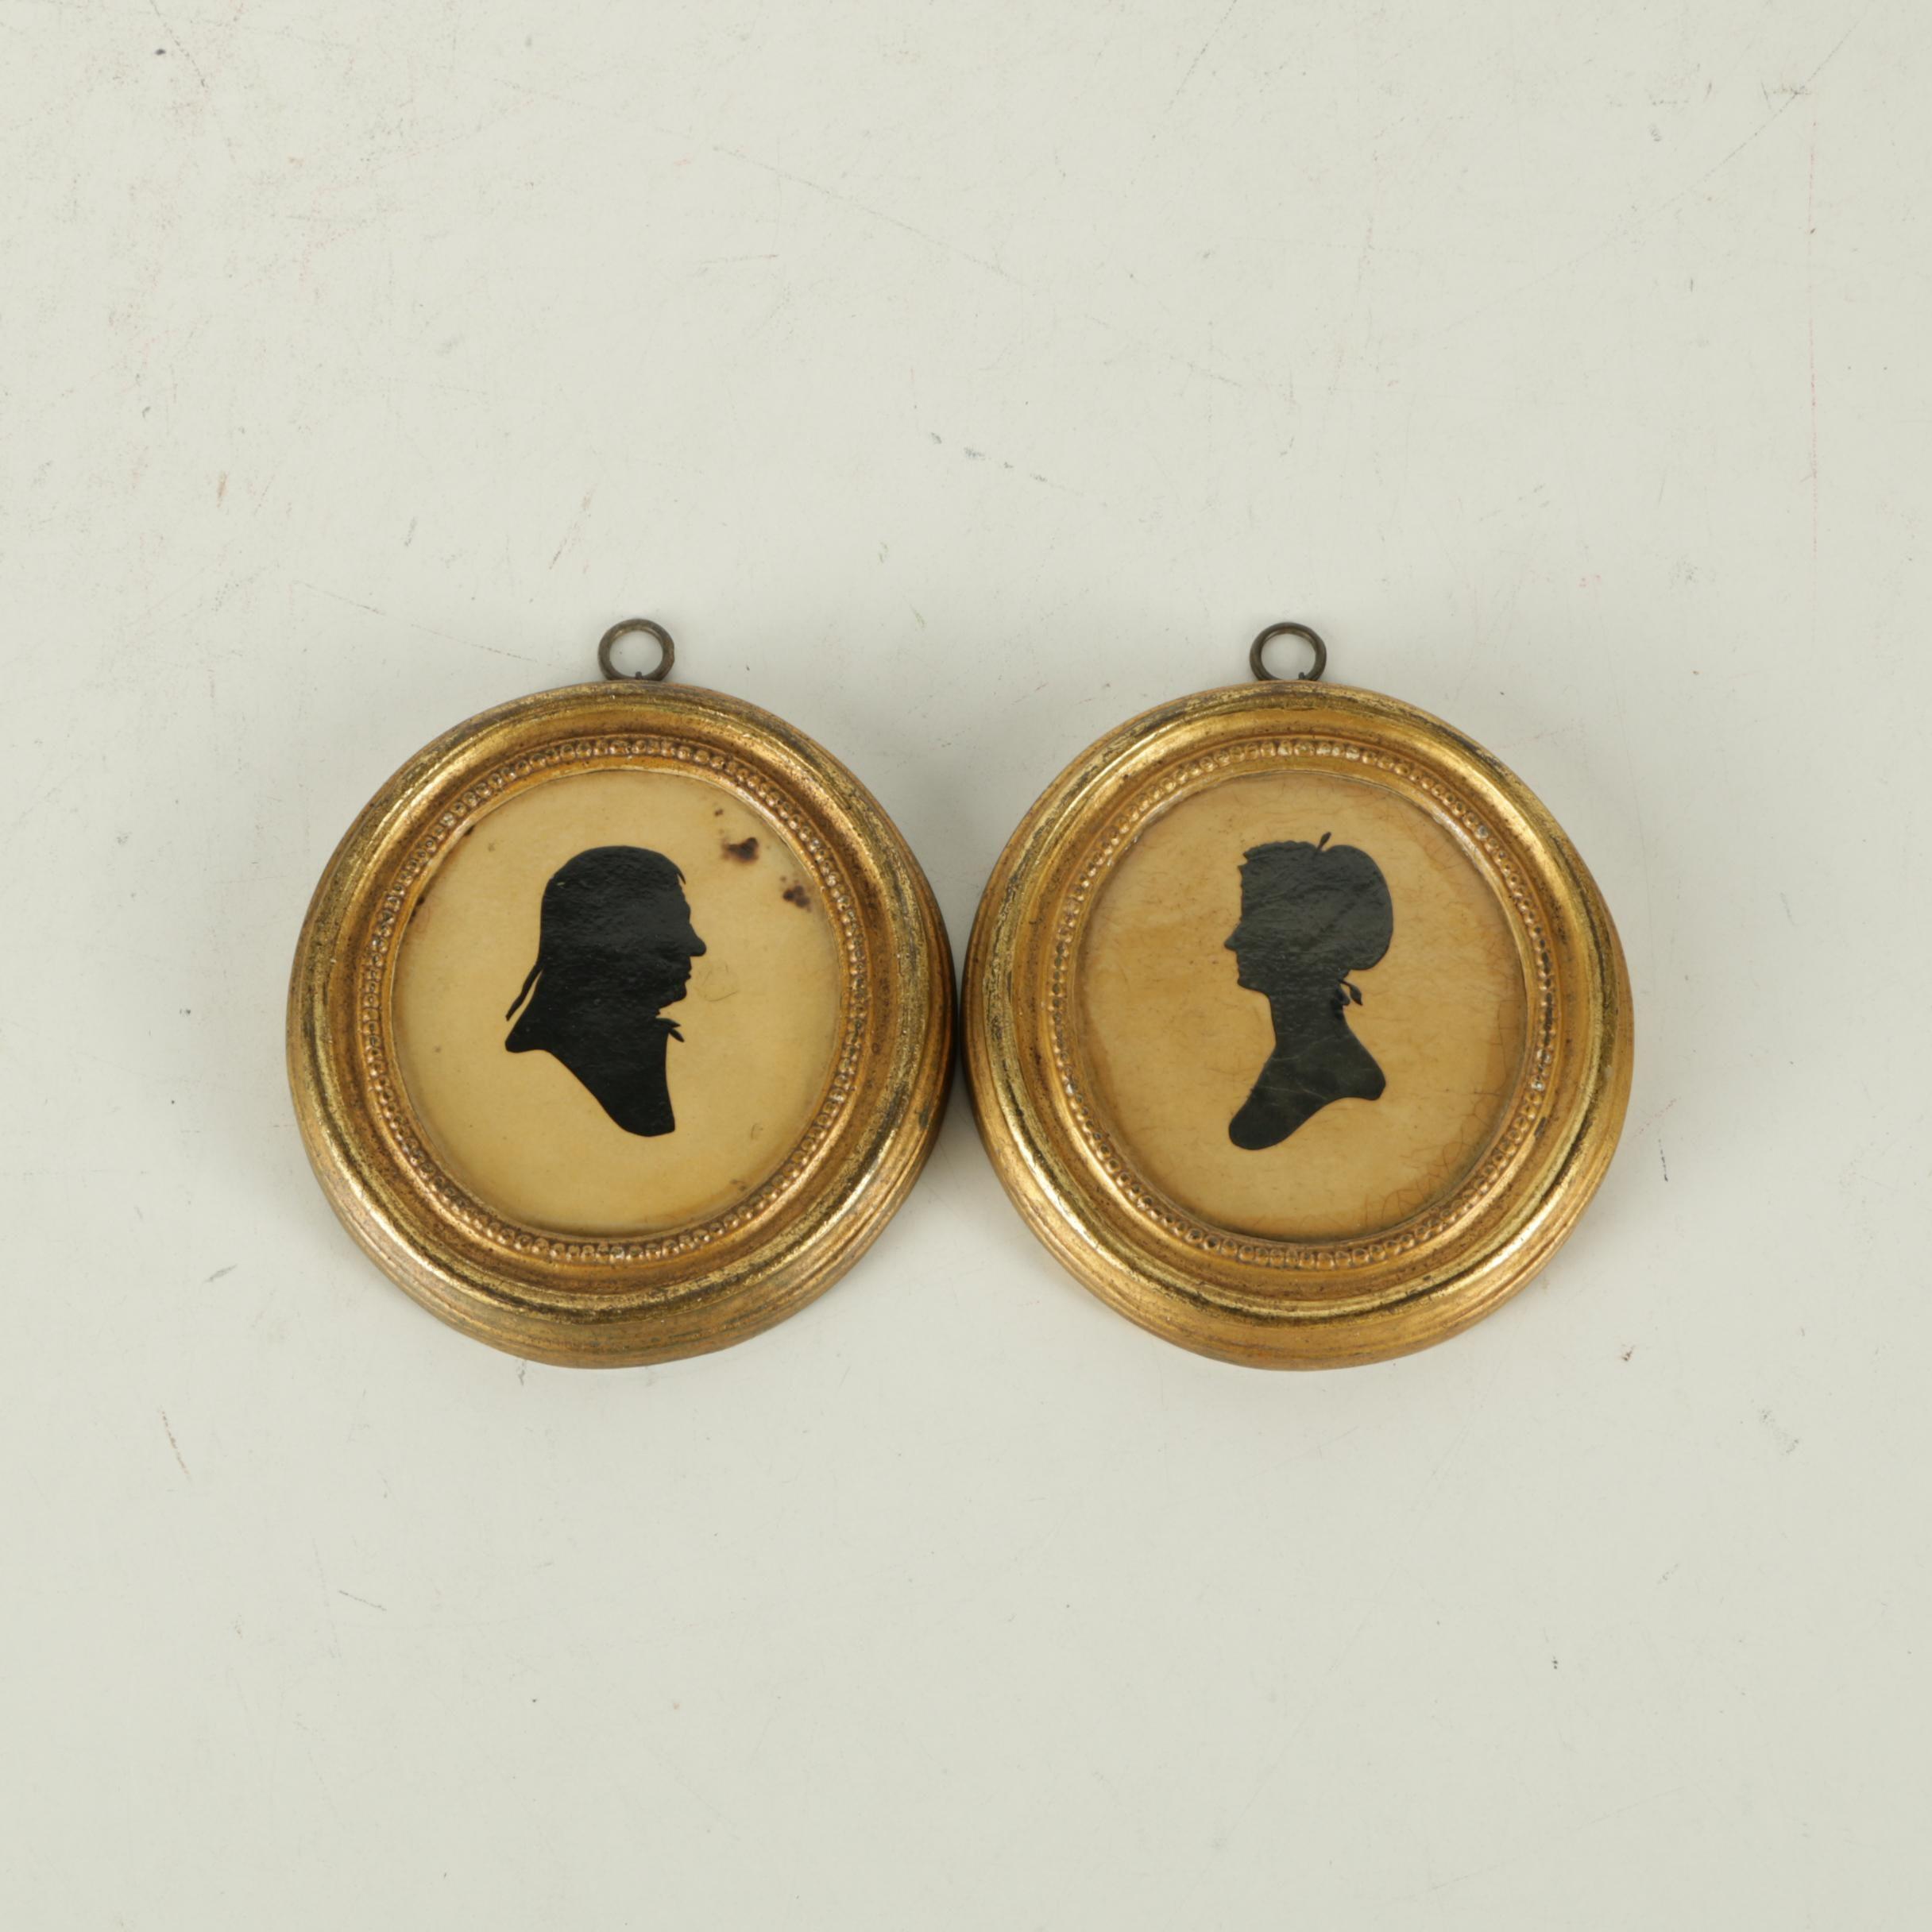 Silhouette Portraits on Ceramic